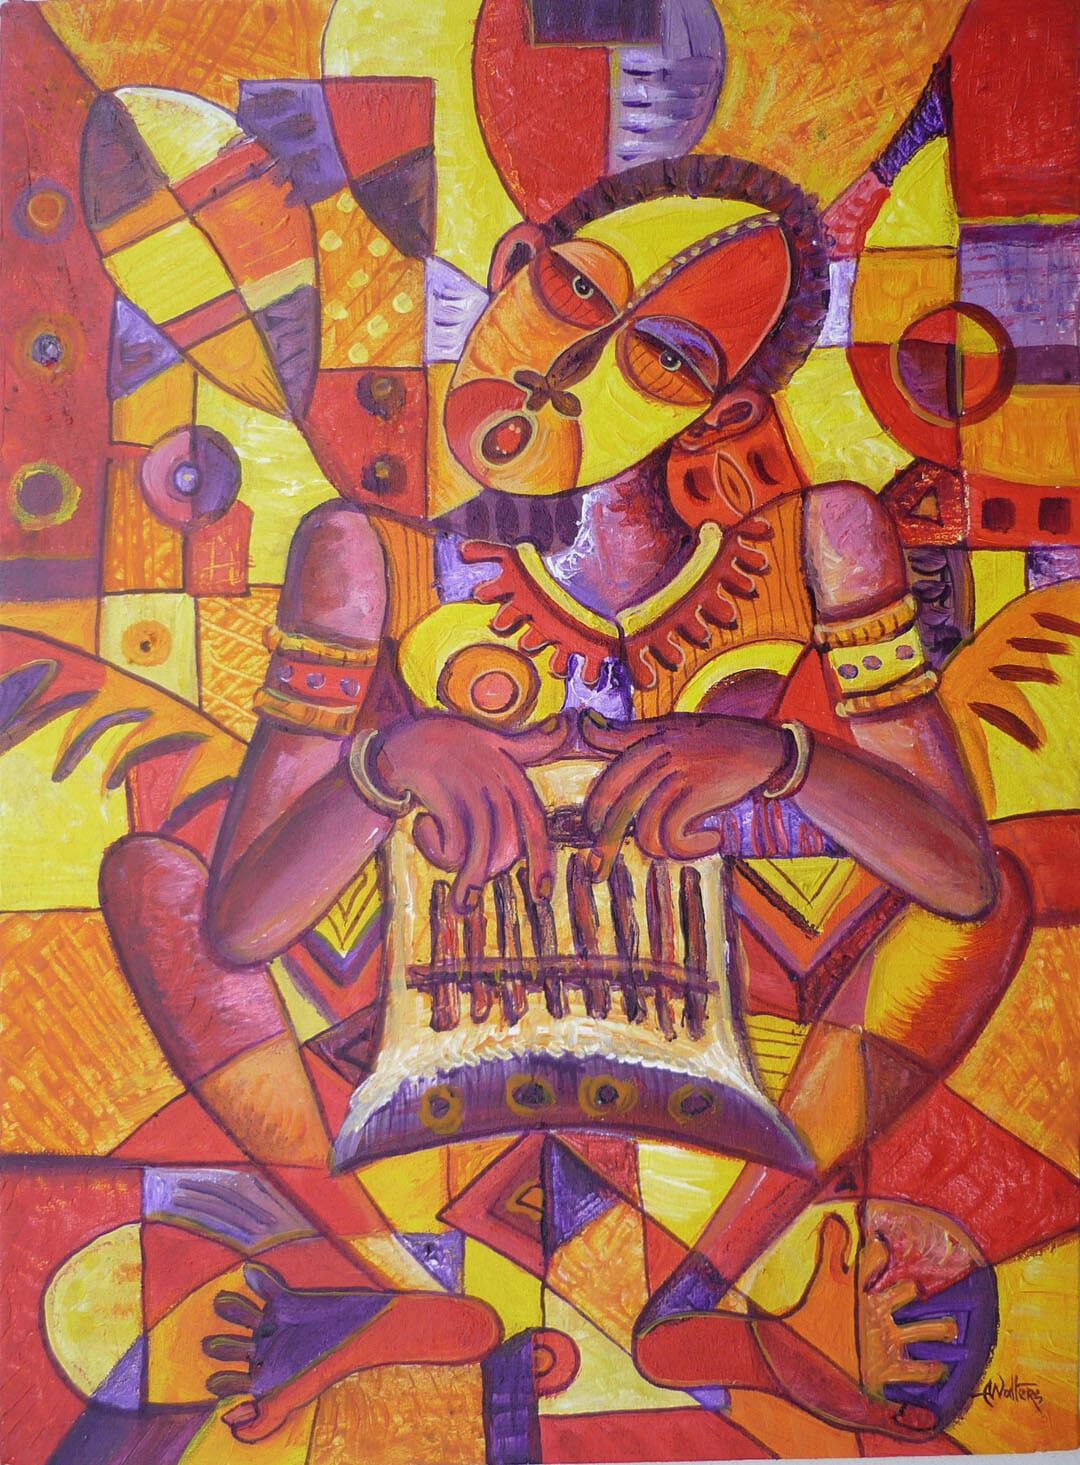 Naïve art painting of an African drum player.